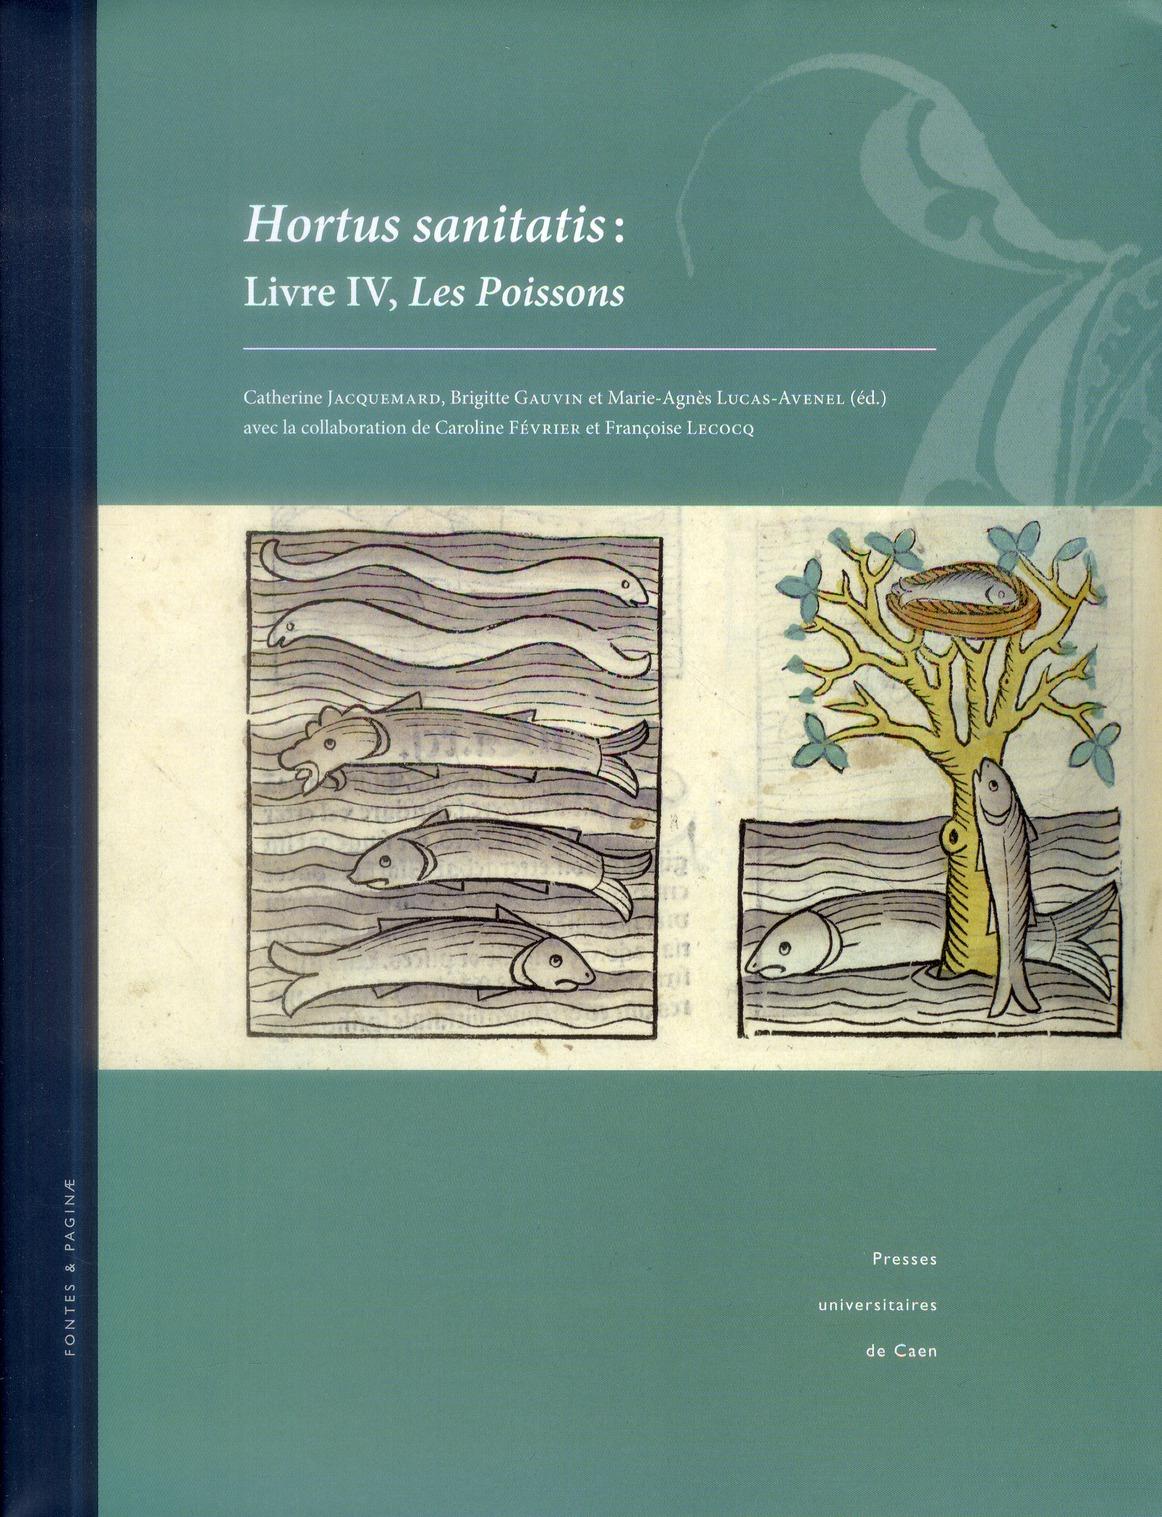 HORTUS SANITATIS. LIVRE IV, LES POISSONS